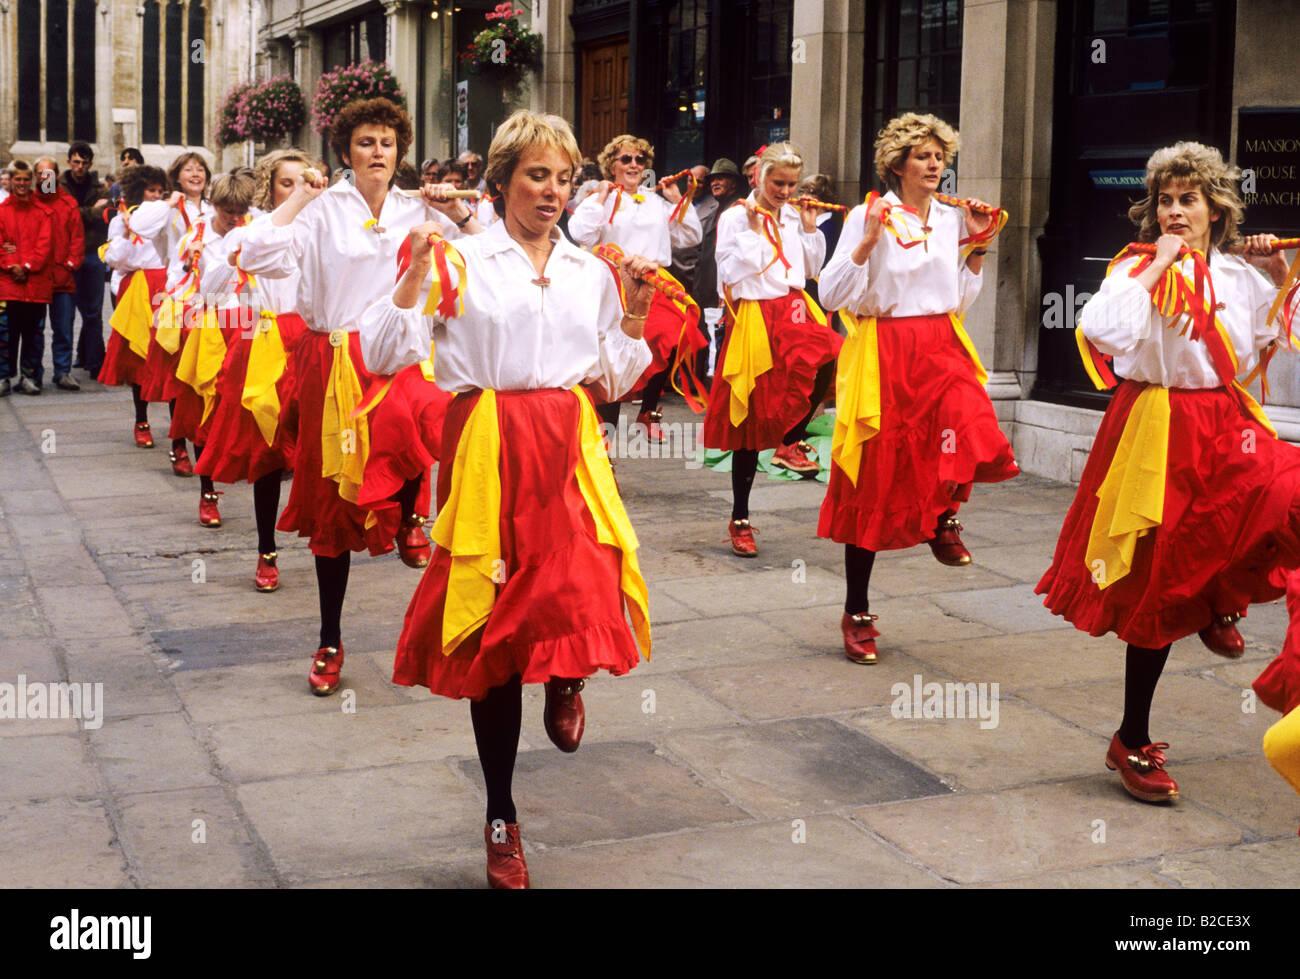 Women Ladies clog dancing dance red skirts York street dance entertainment performers Yorkshire England English - Stock Image